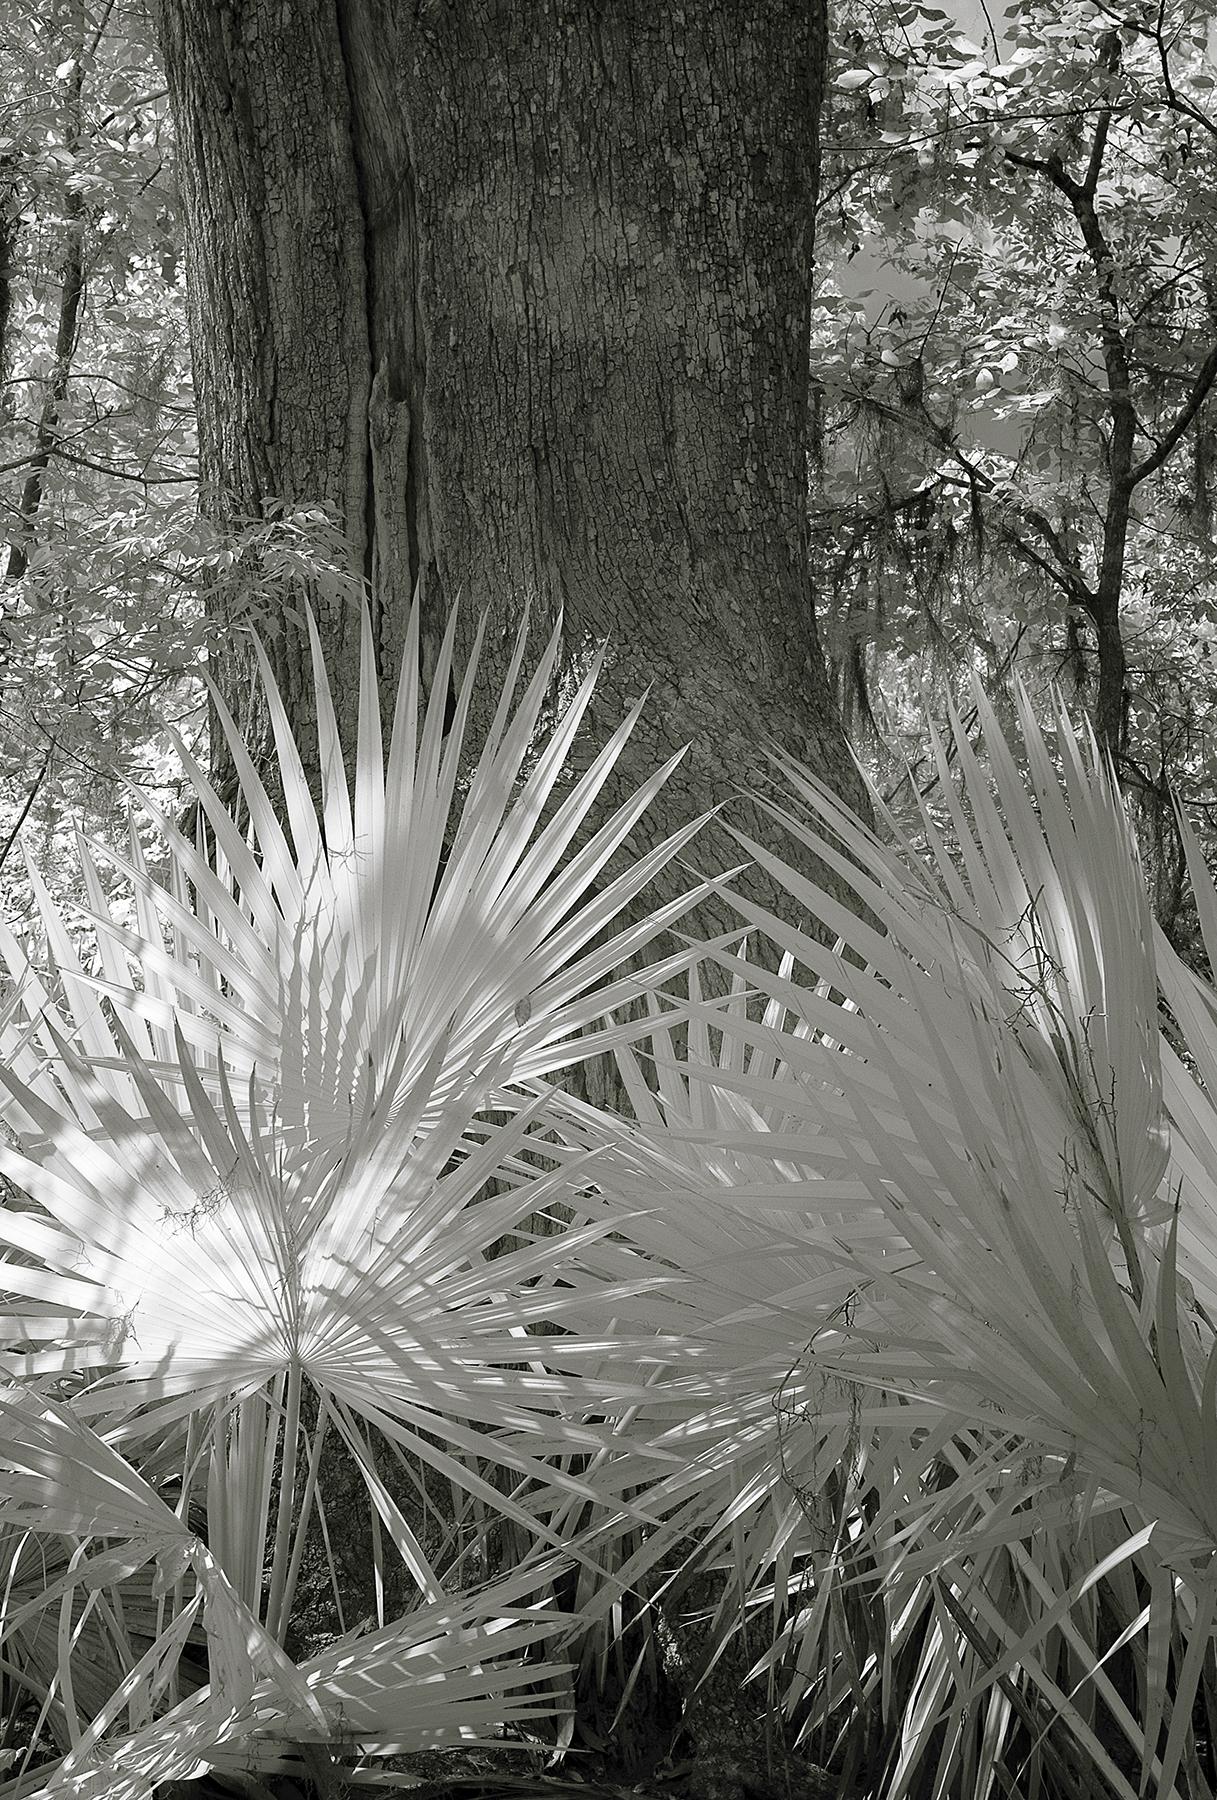 nola - ir - ferns and tree.jpg